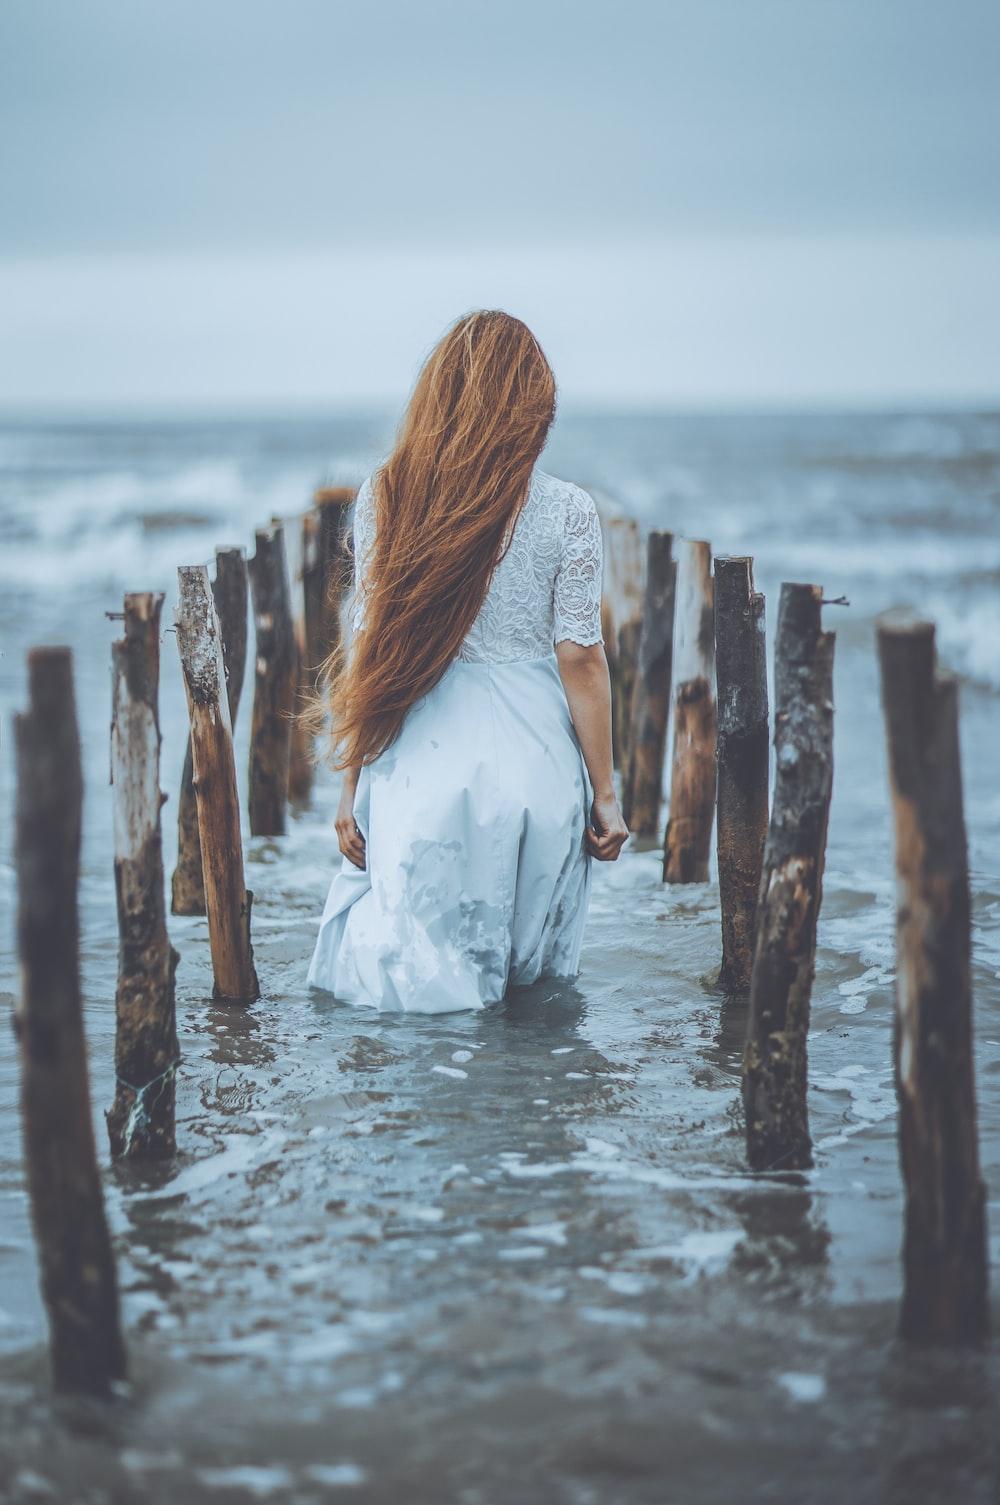 woman standing on water in between logs